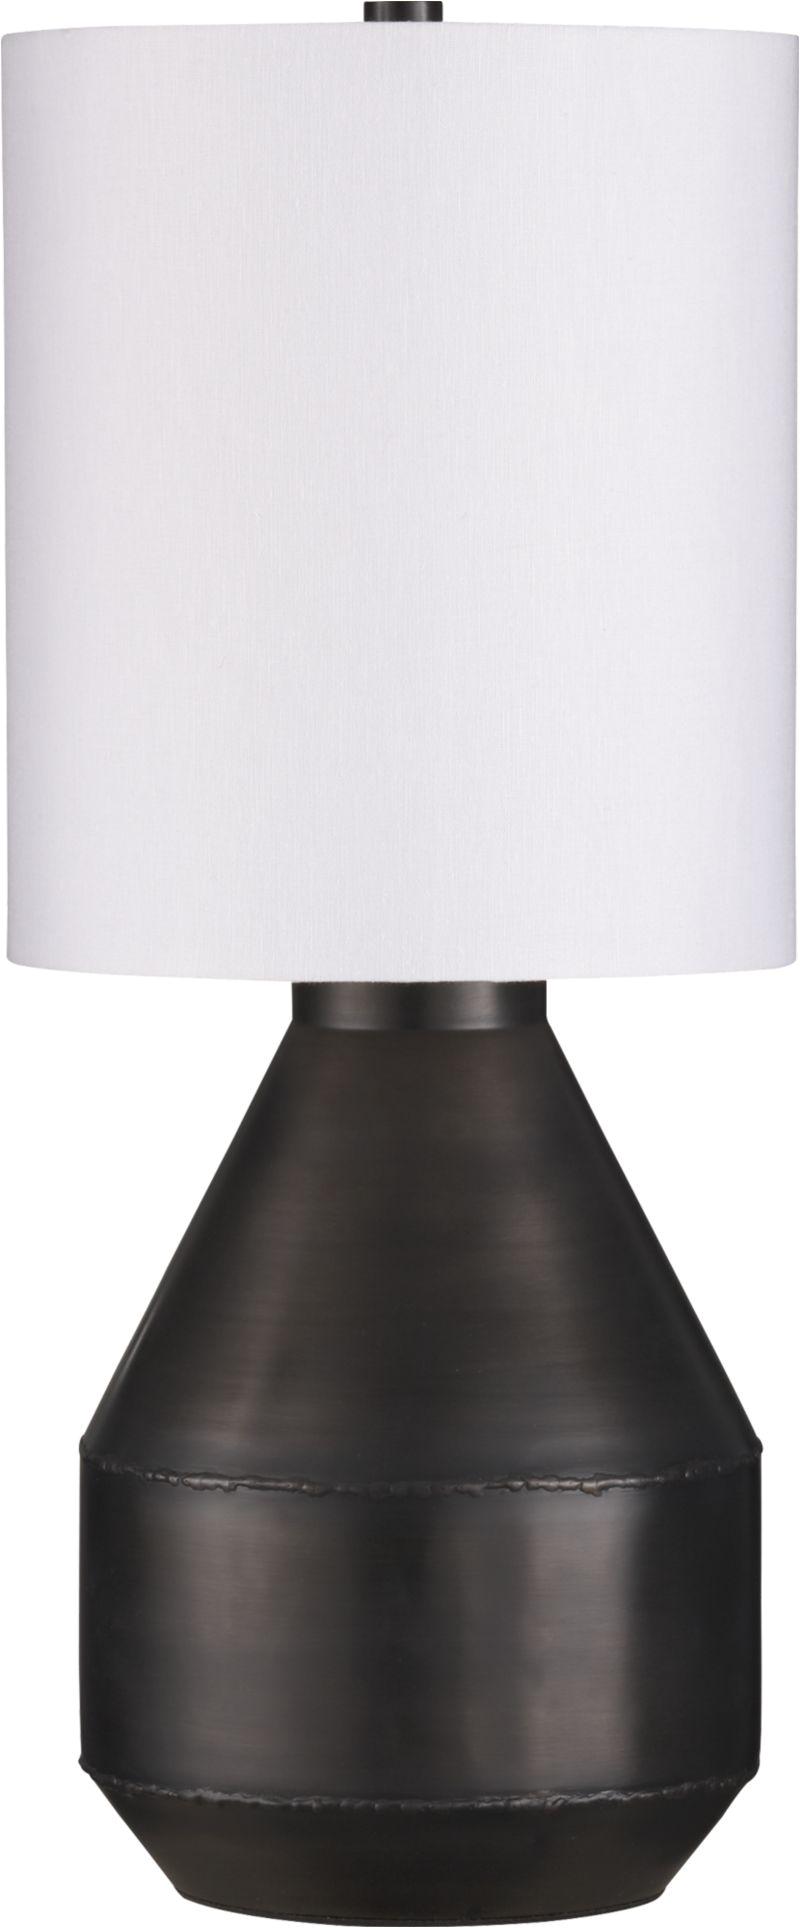 Crate and Barrel Light Fixtures Levi Table Lamp Crate Barrel Bicmarkit Tuxedo Black